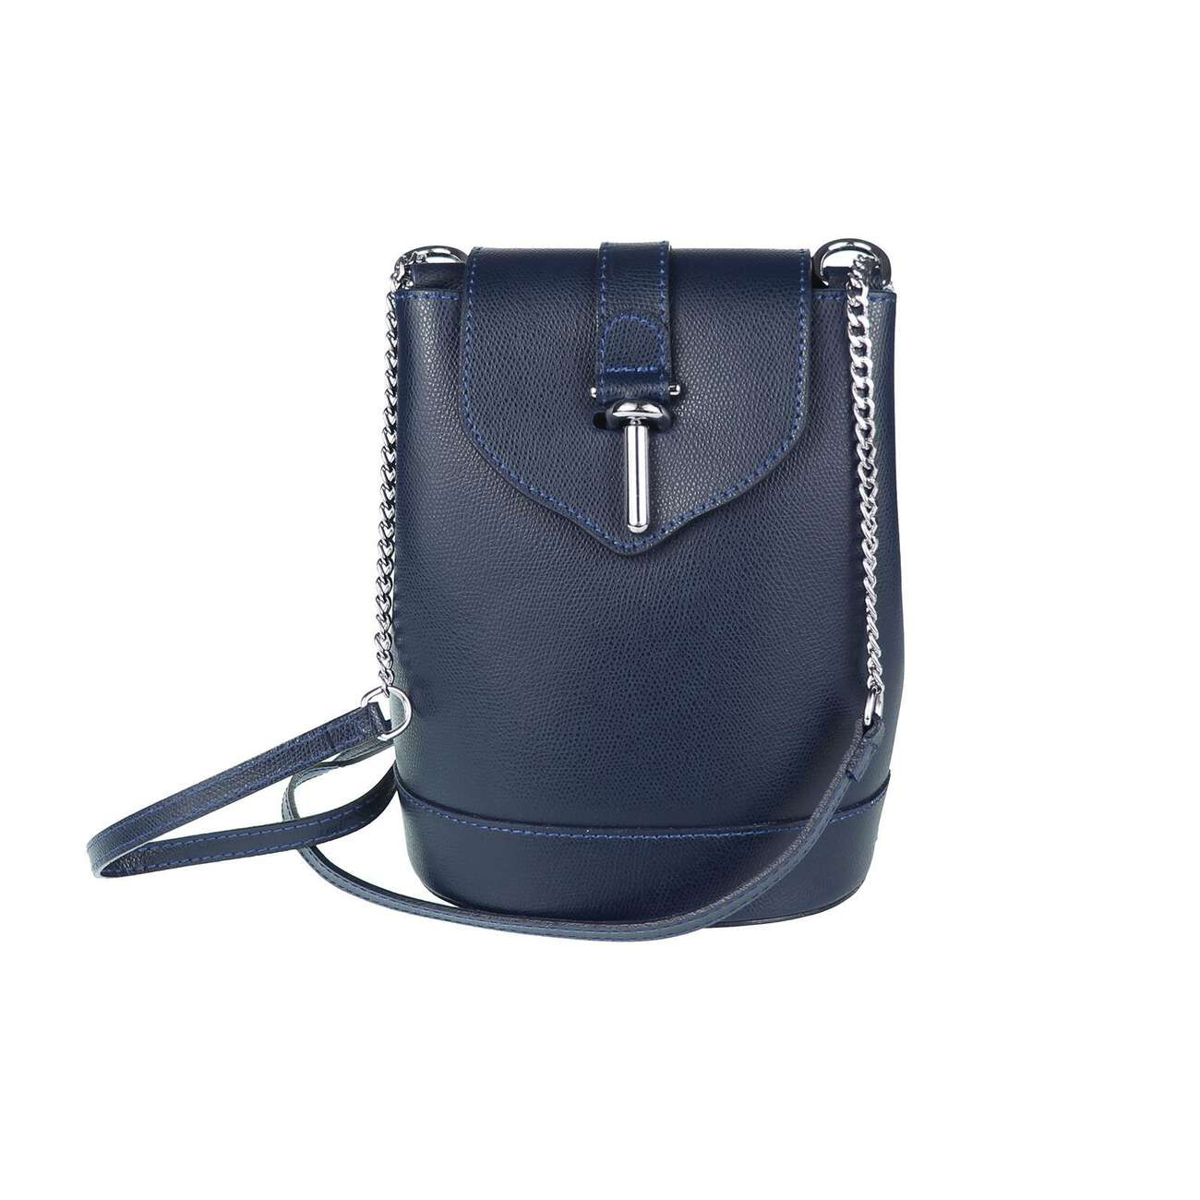 obc ledertasche damen tasche 2in1 handtasche kette rucksack umh ngetasche schultertasche. Black Bedroom Furniture Sets. Home Design Ideas